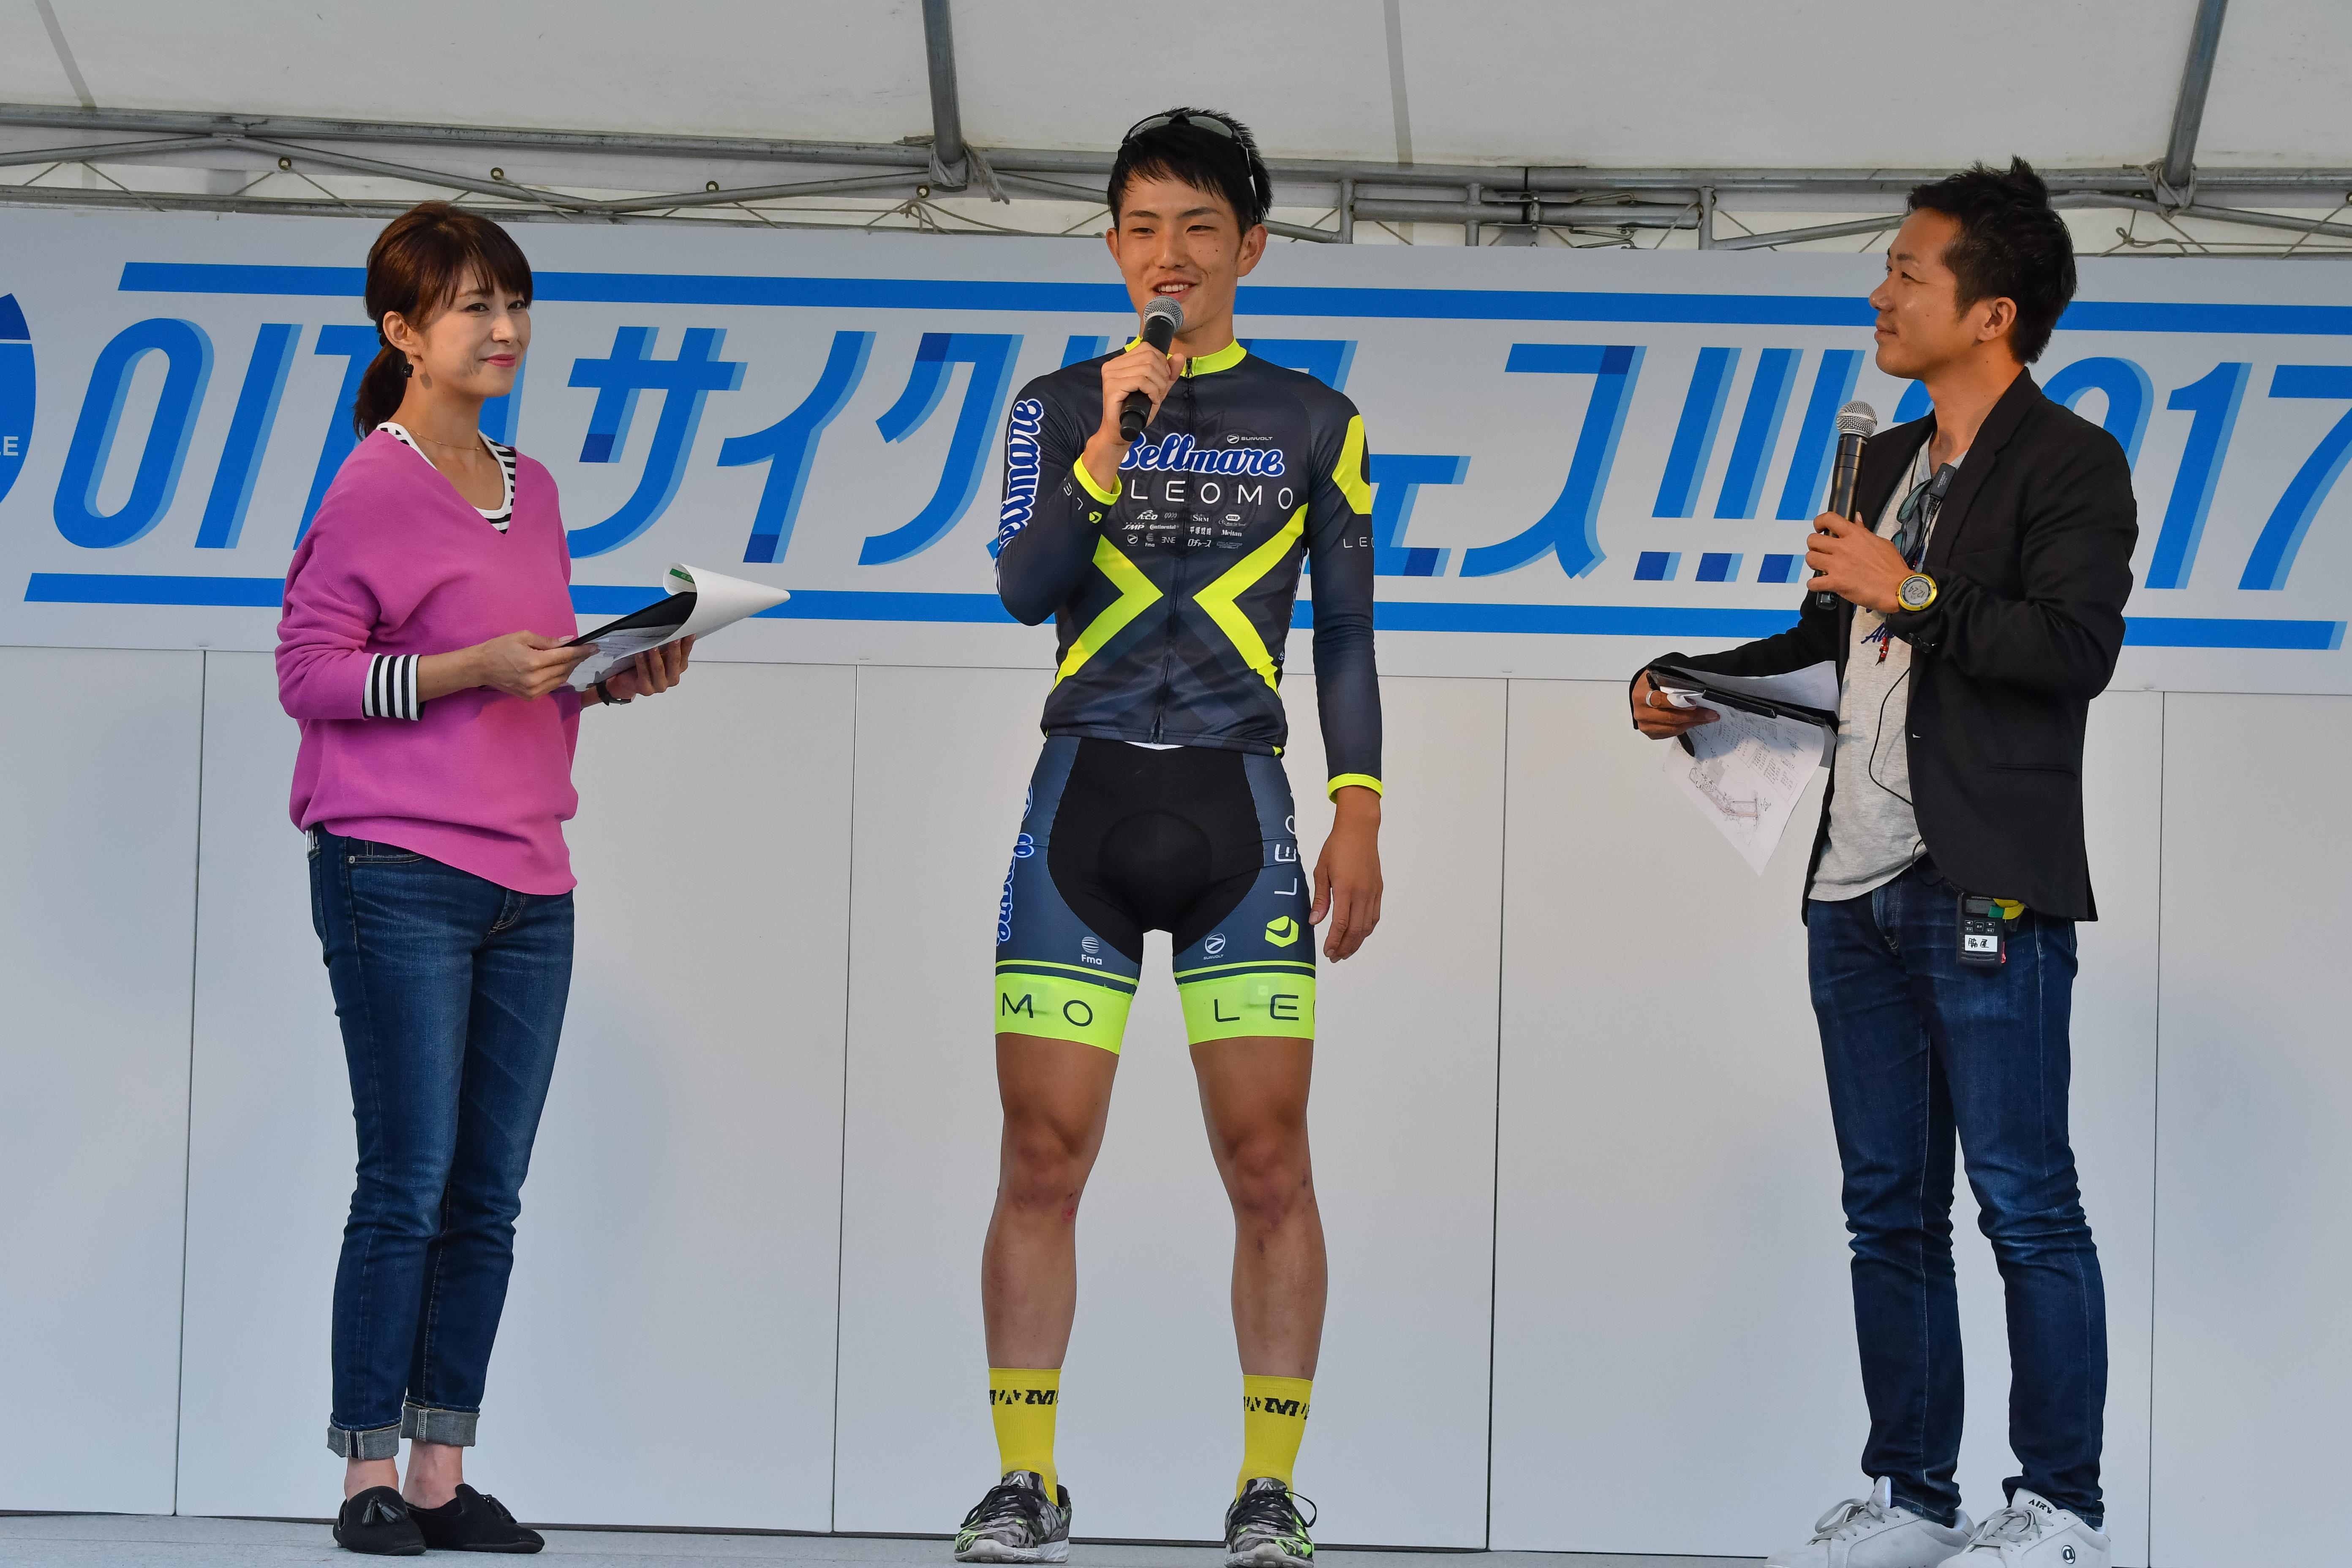 20171014-15@JBCF-OITA-2